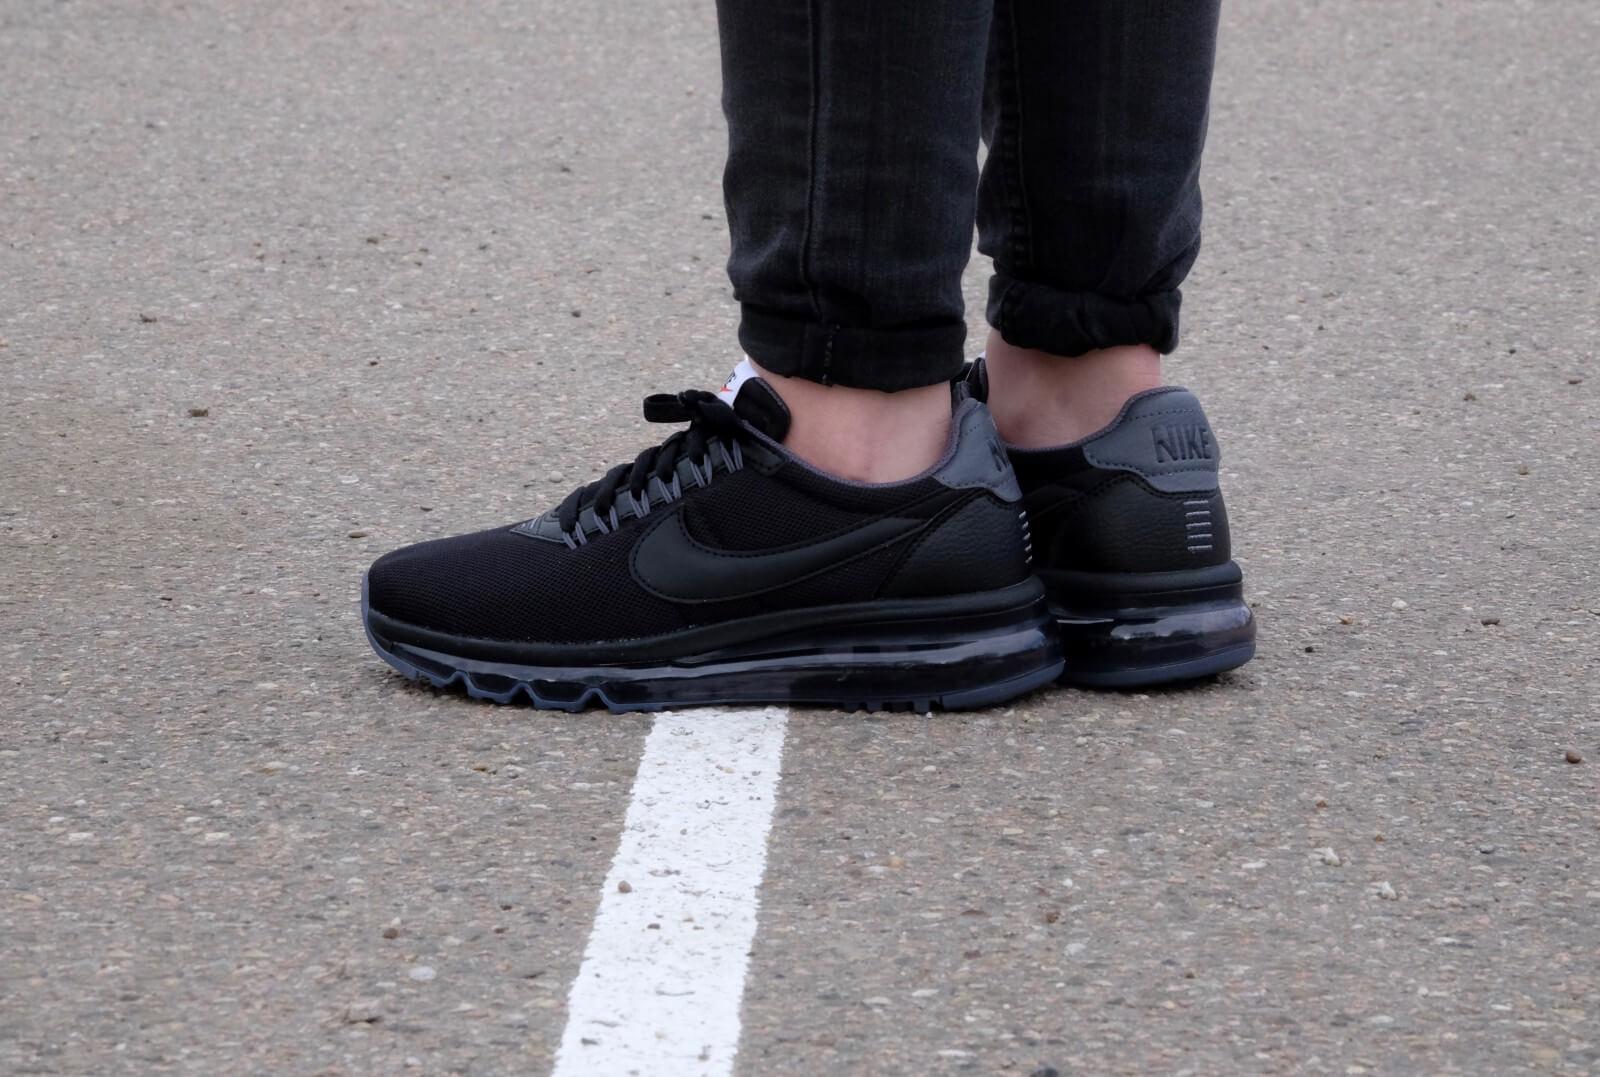 Nike Air Max LD Zero shoes BLACK DARK GREY 896495-002 Wmn Sz 9